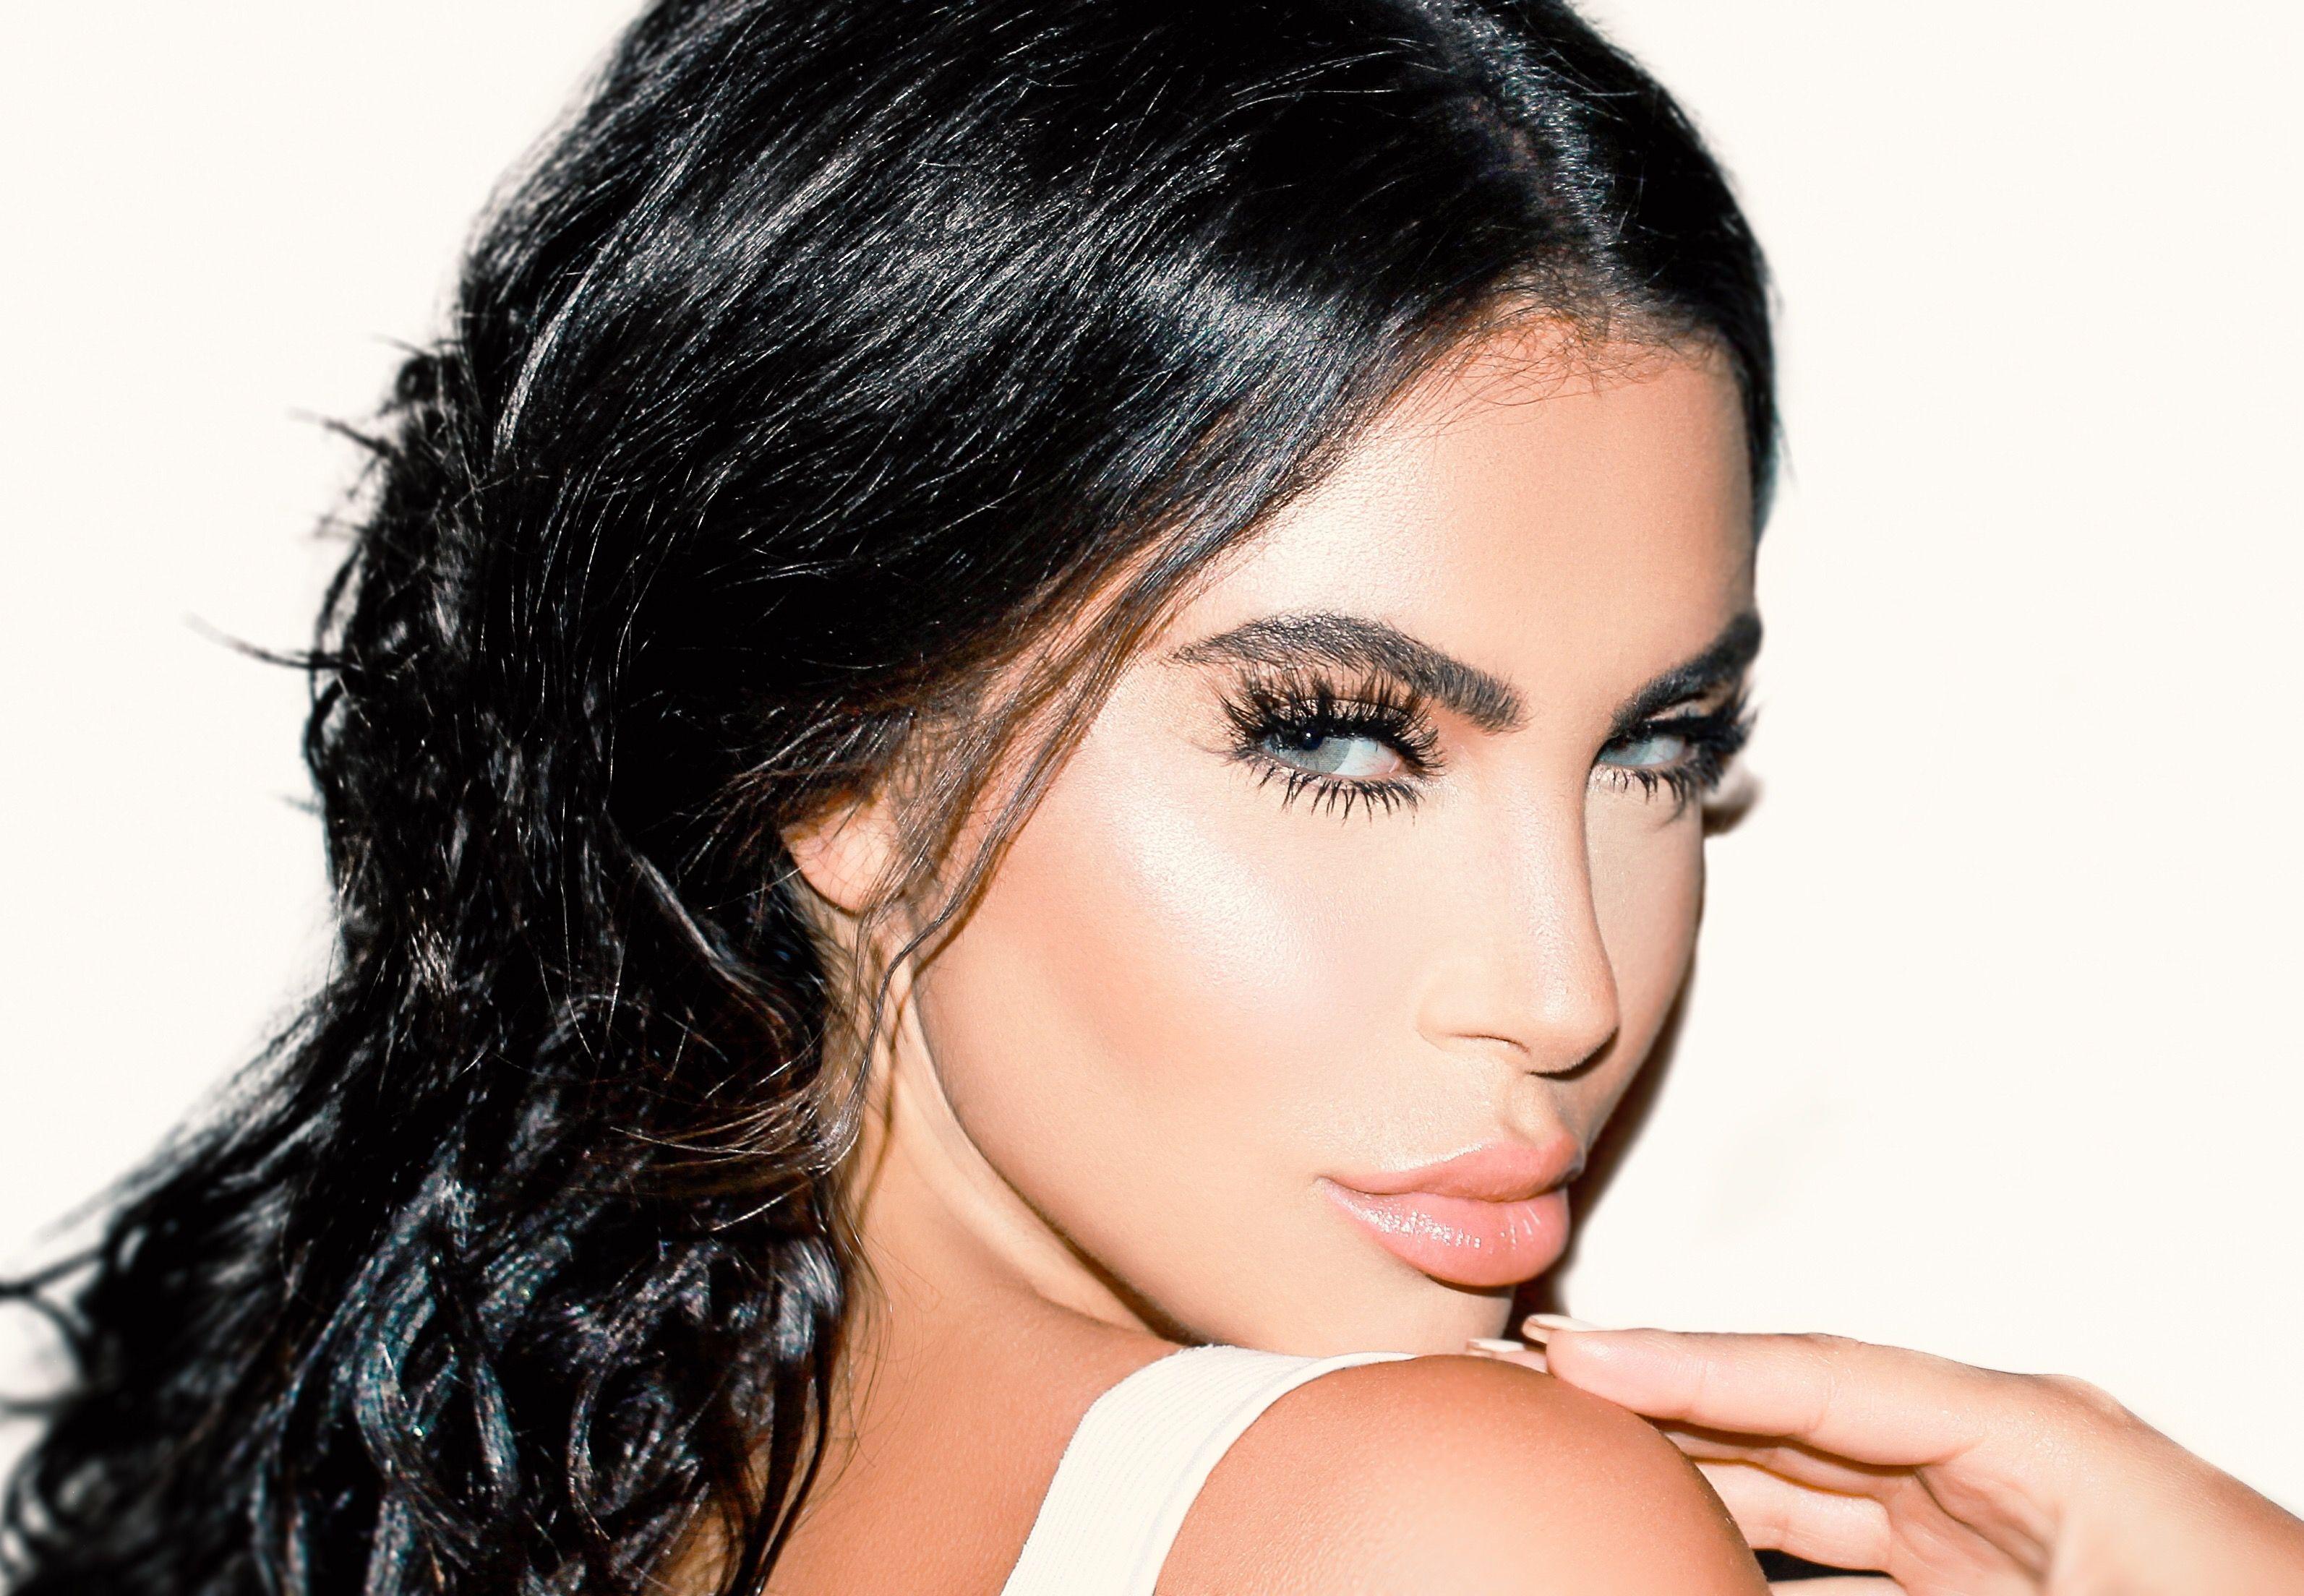 Celebrity Makeup Artist Hrush Achemyan S Top Beauty Products For 2018 Celebrity Makeup Artist Kardashian Makeup Celebrity Makeup